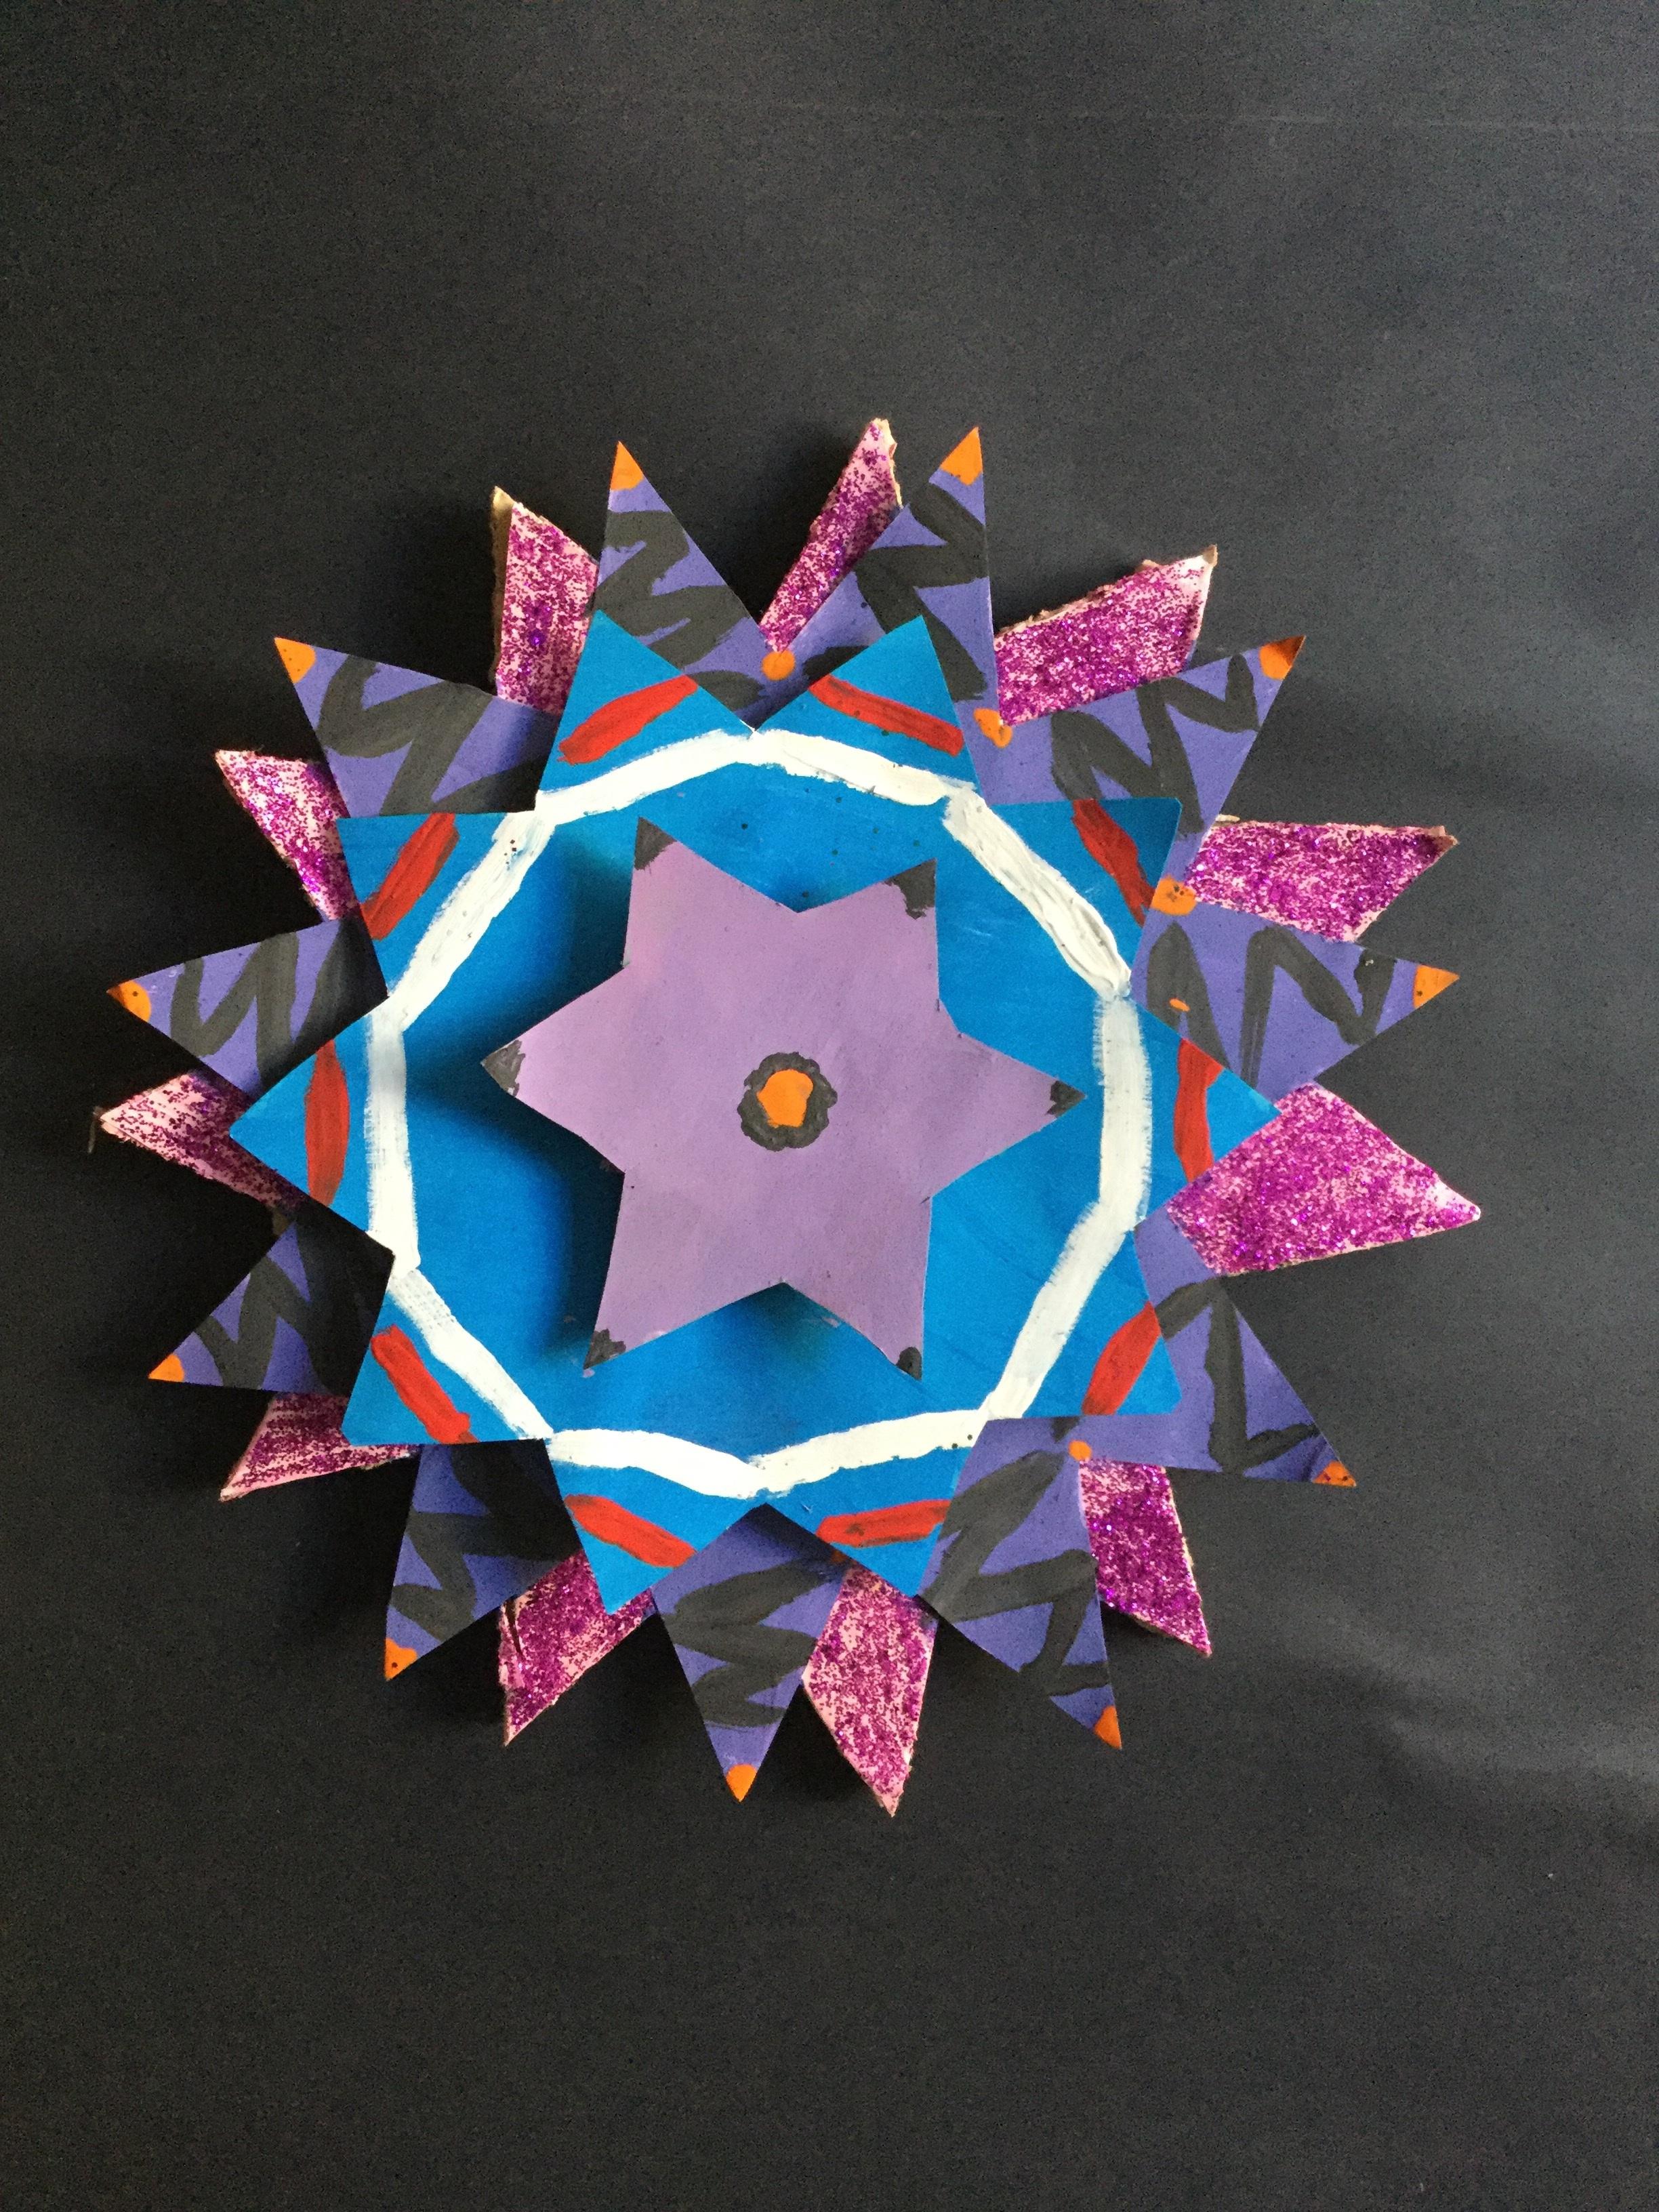 Free Images Wheel Flower Petal Color Pink Material Circle